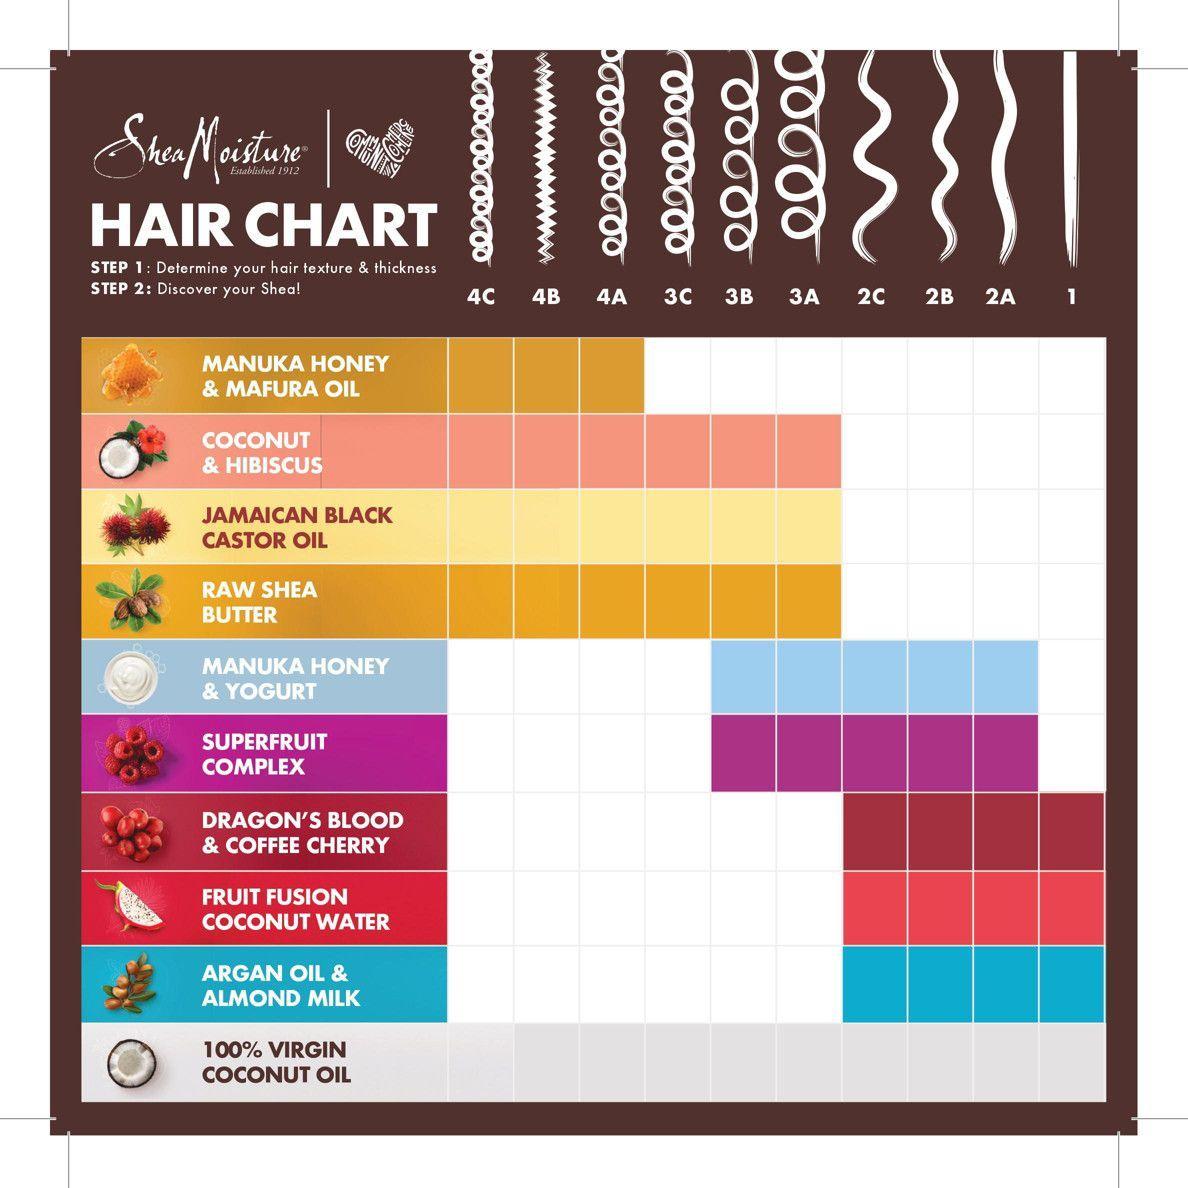 Shea Moisture Hair Chart 1188 1188 In 2020 Hair Chart Shea